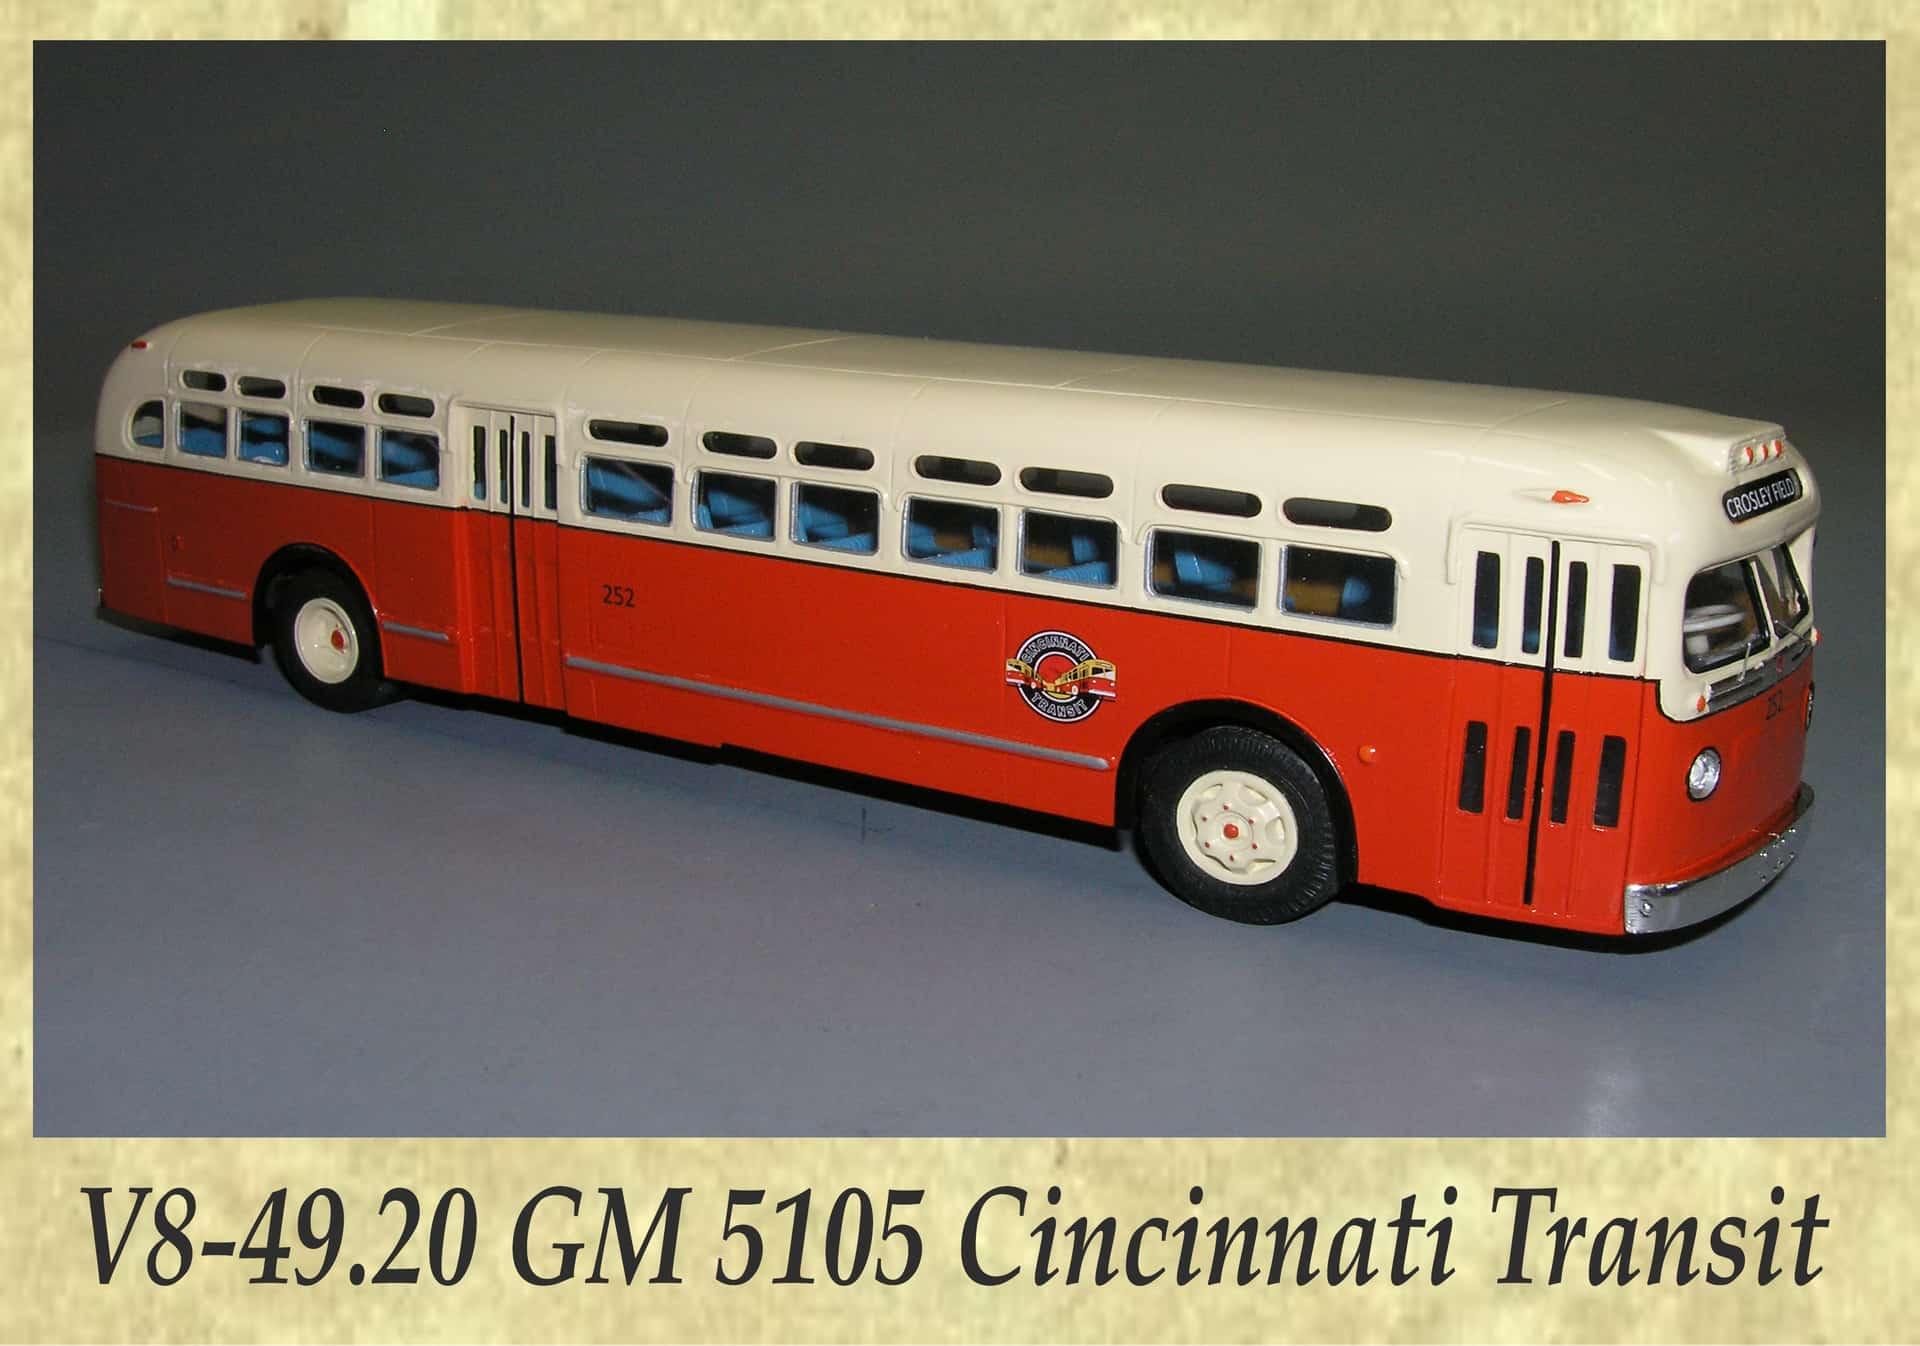 V8-49.20 GM 5105 Cincinnati Transit